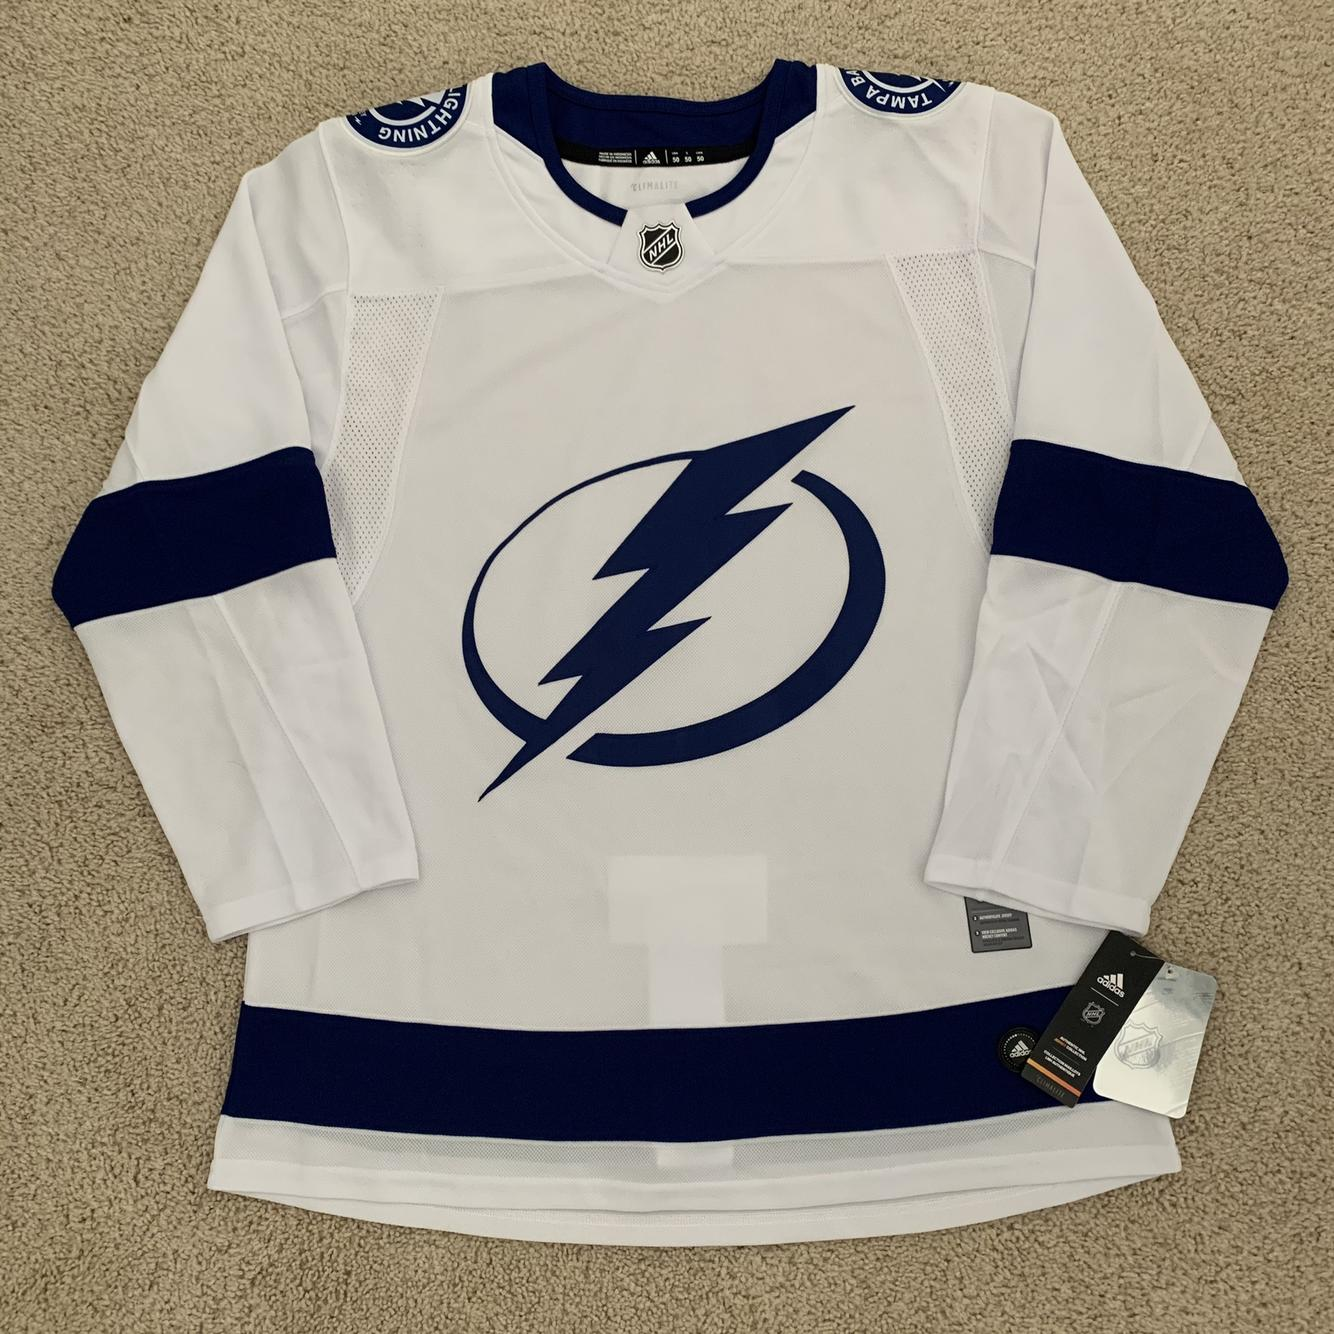 Size 50) Adidas Tampa Bay Lightning Authentic White Away Pro ...